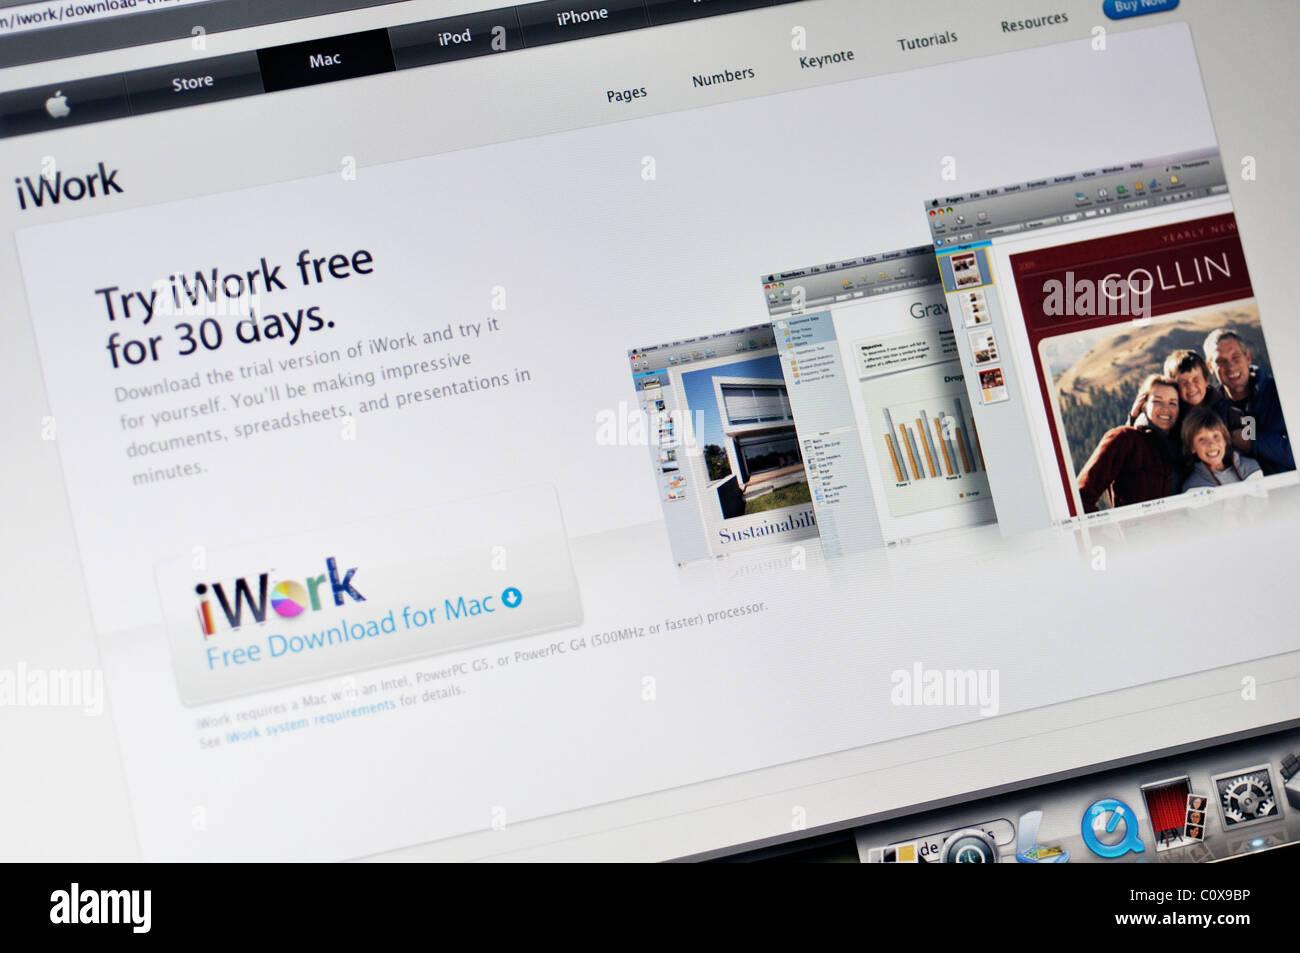 iWork website - office suite of desktop applications created by